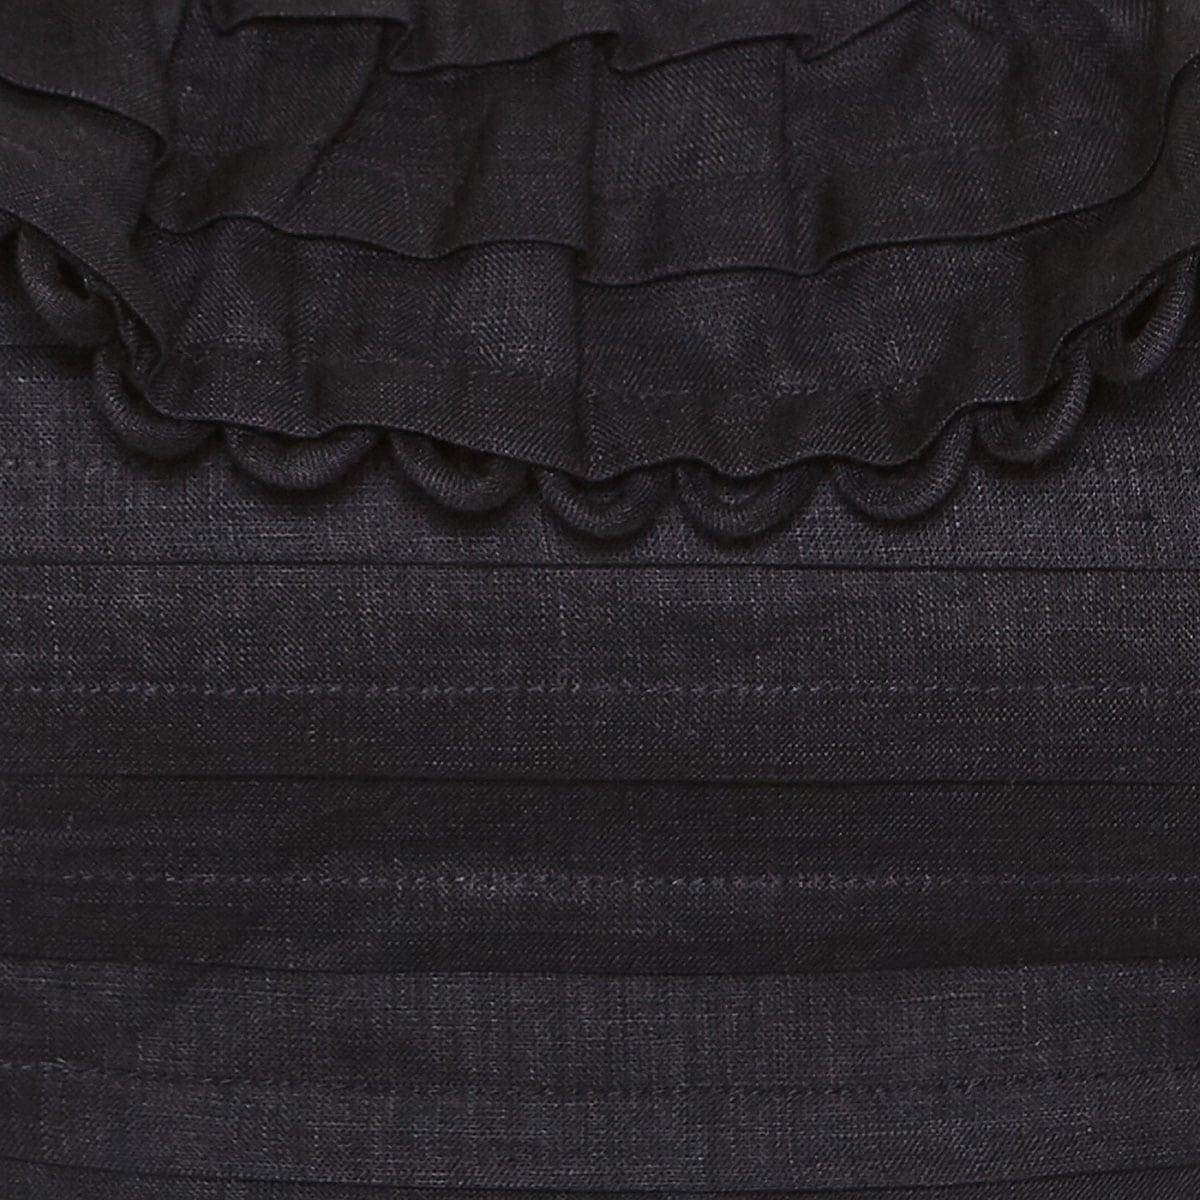 Allia linen cropped top